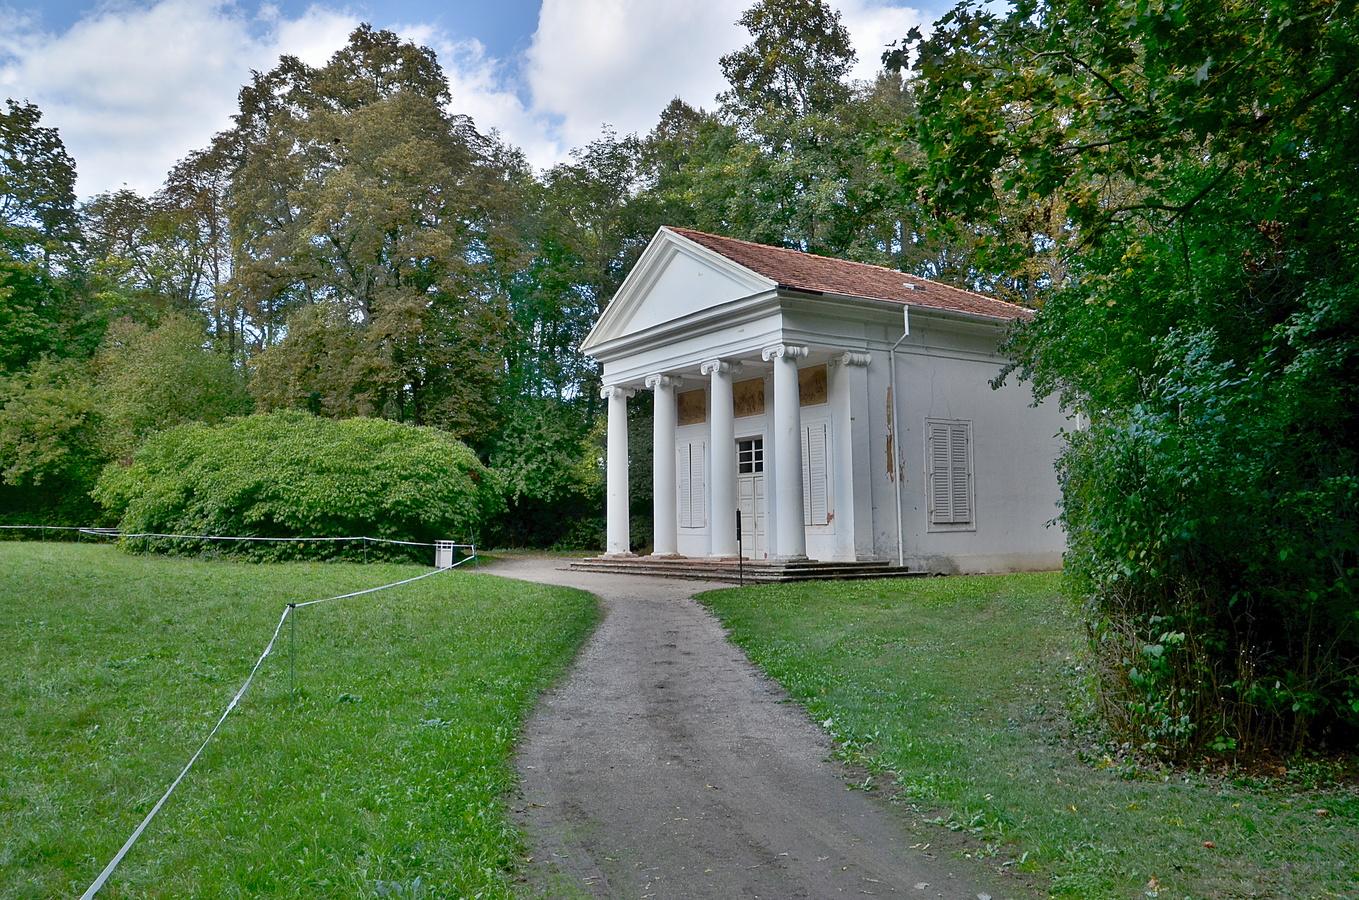 Panův templ